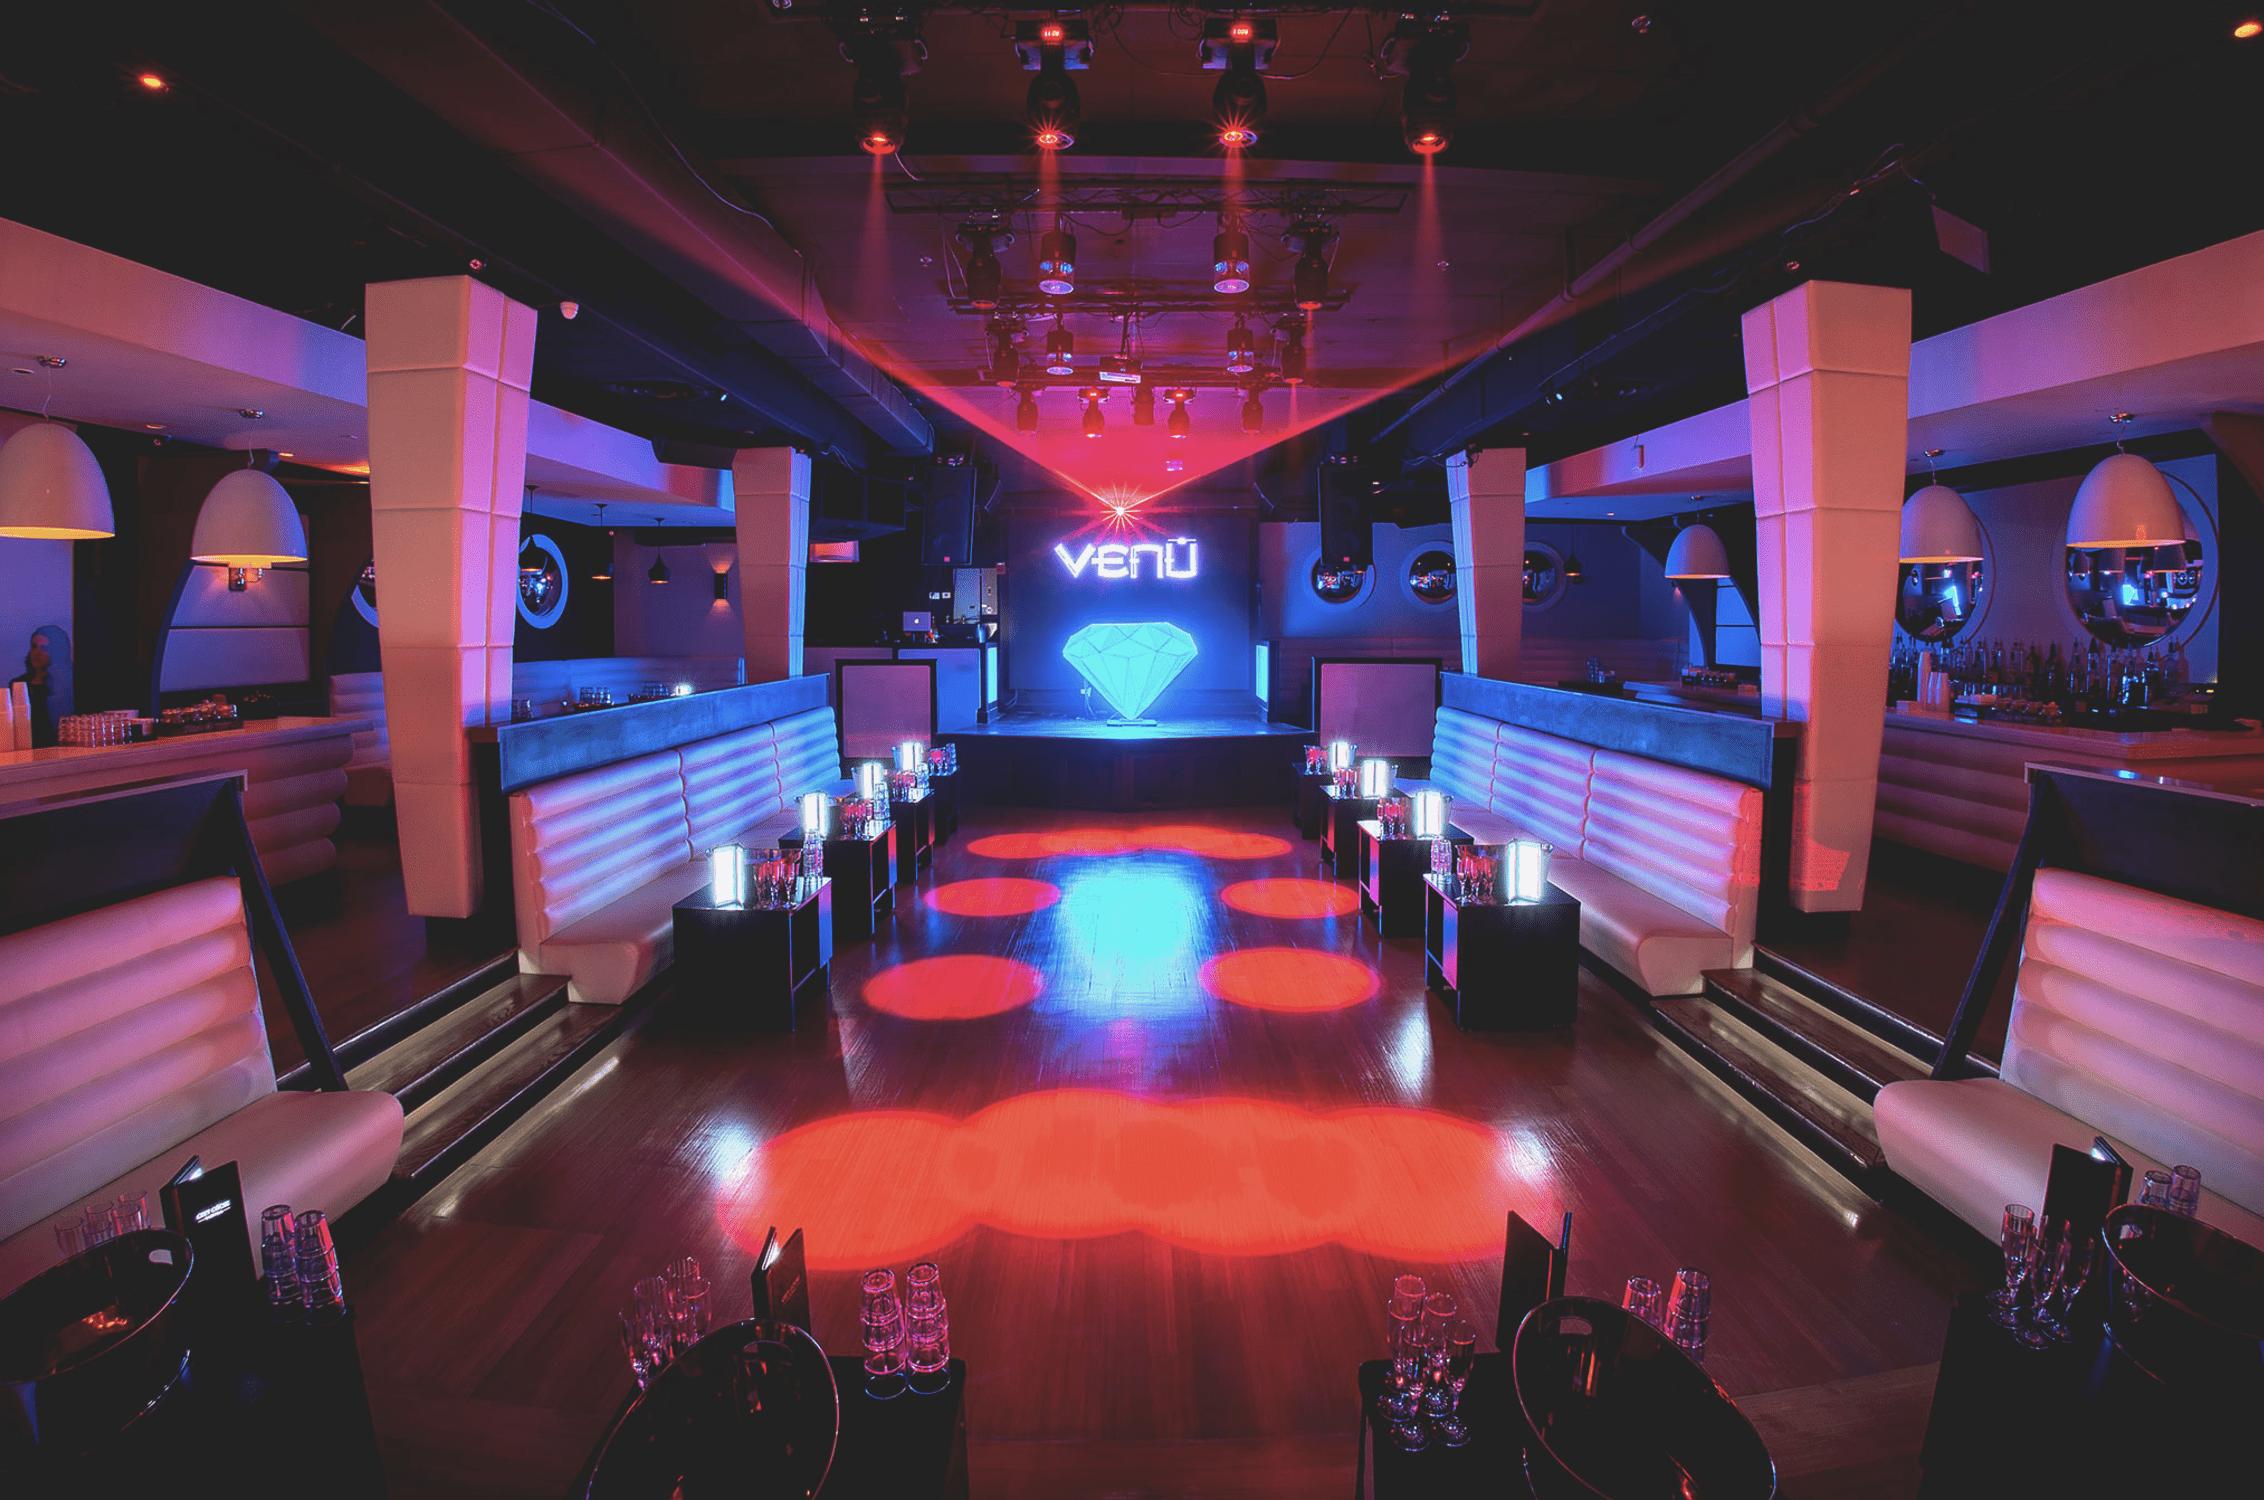 Venu Nightclub